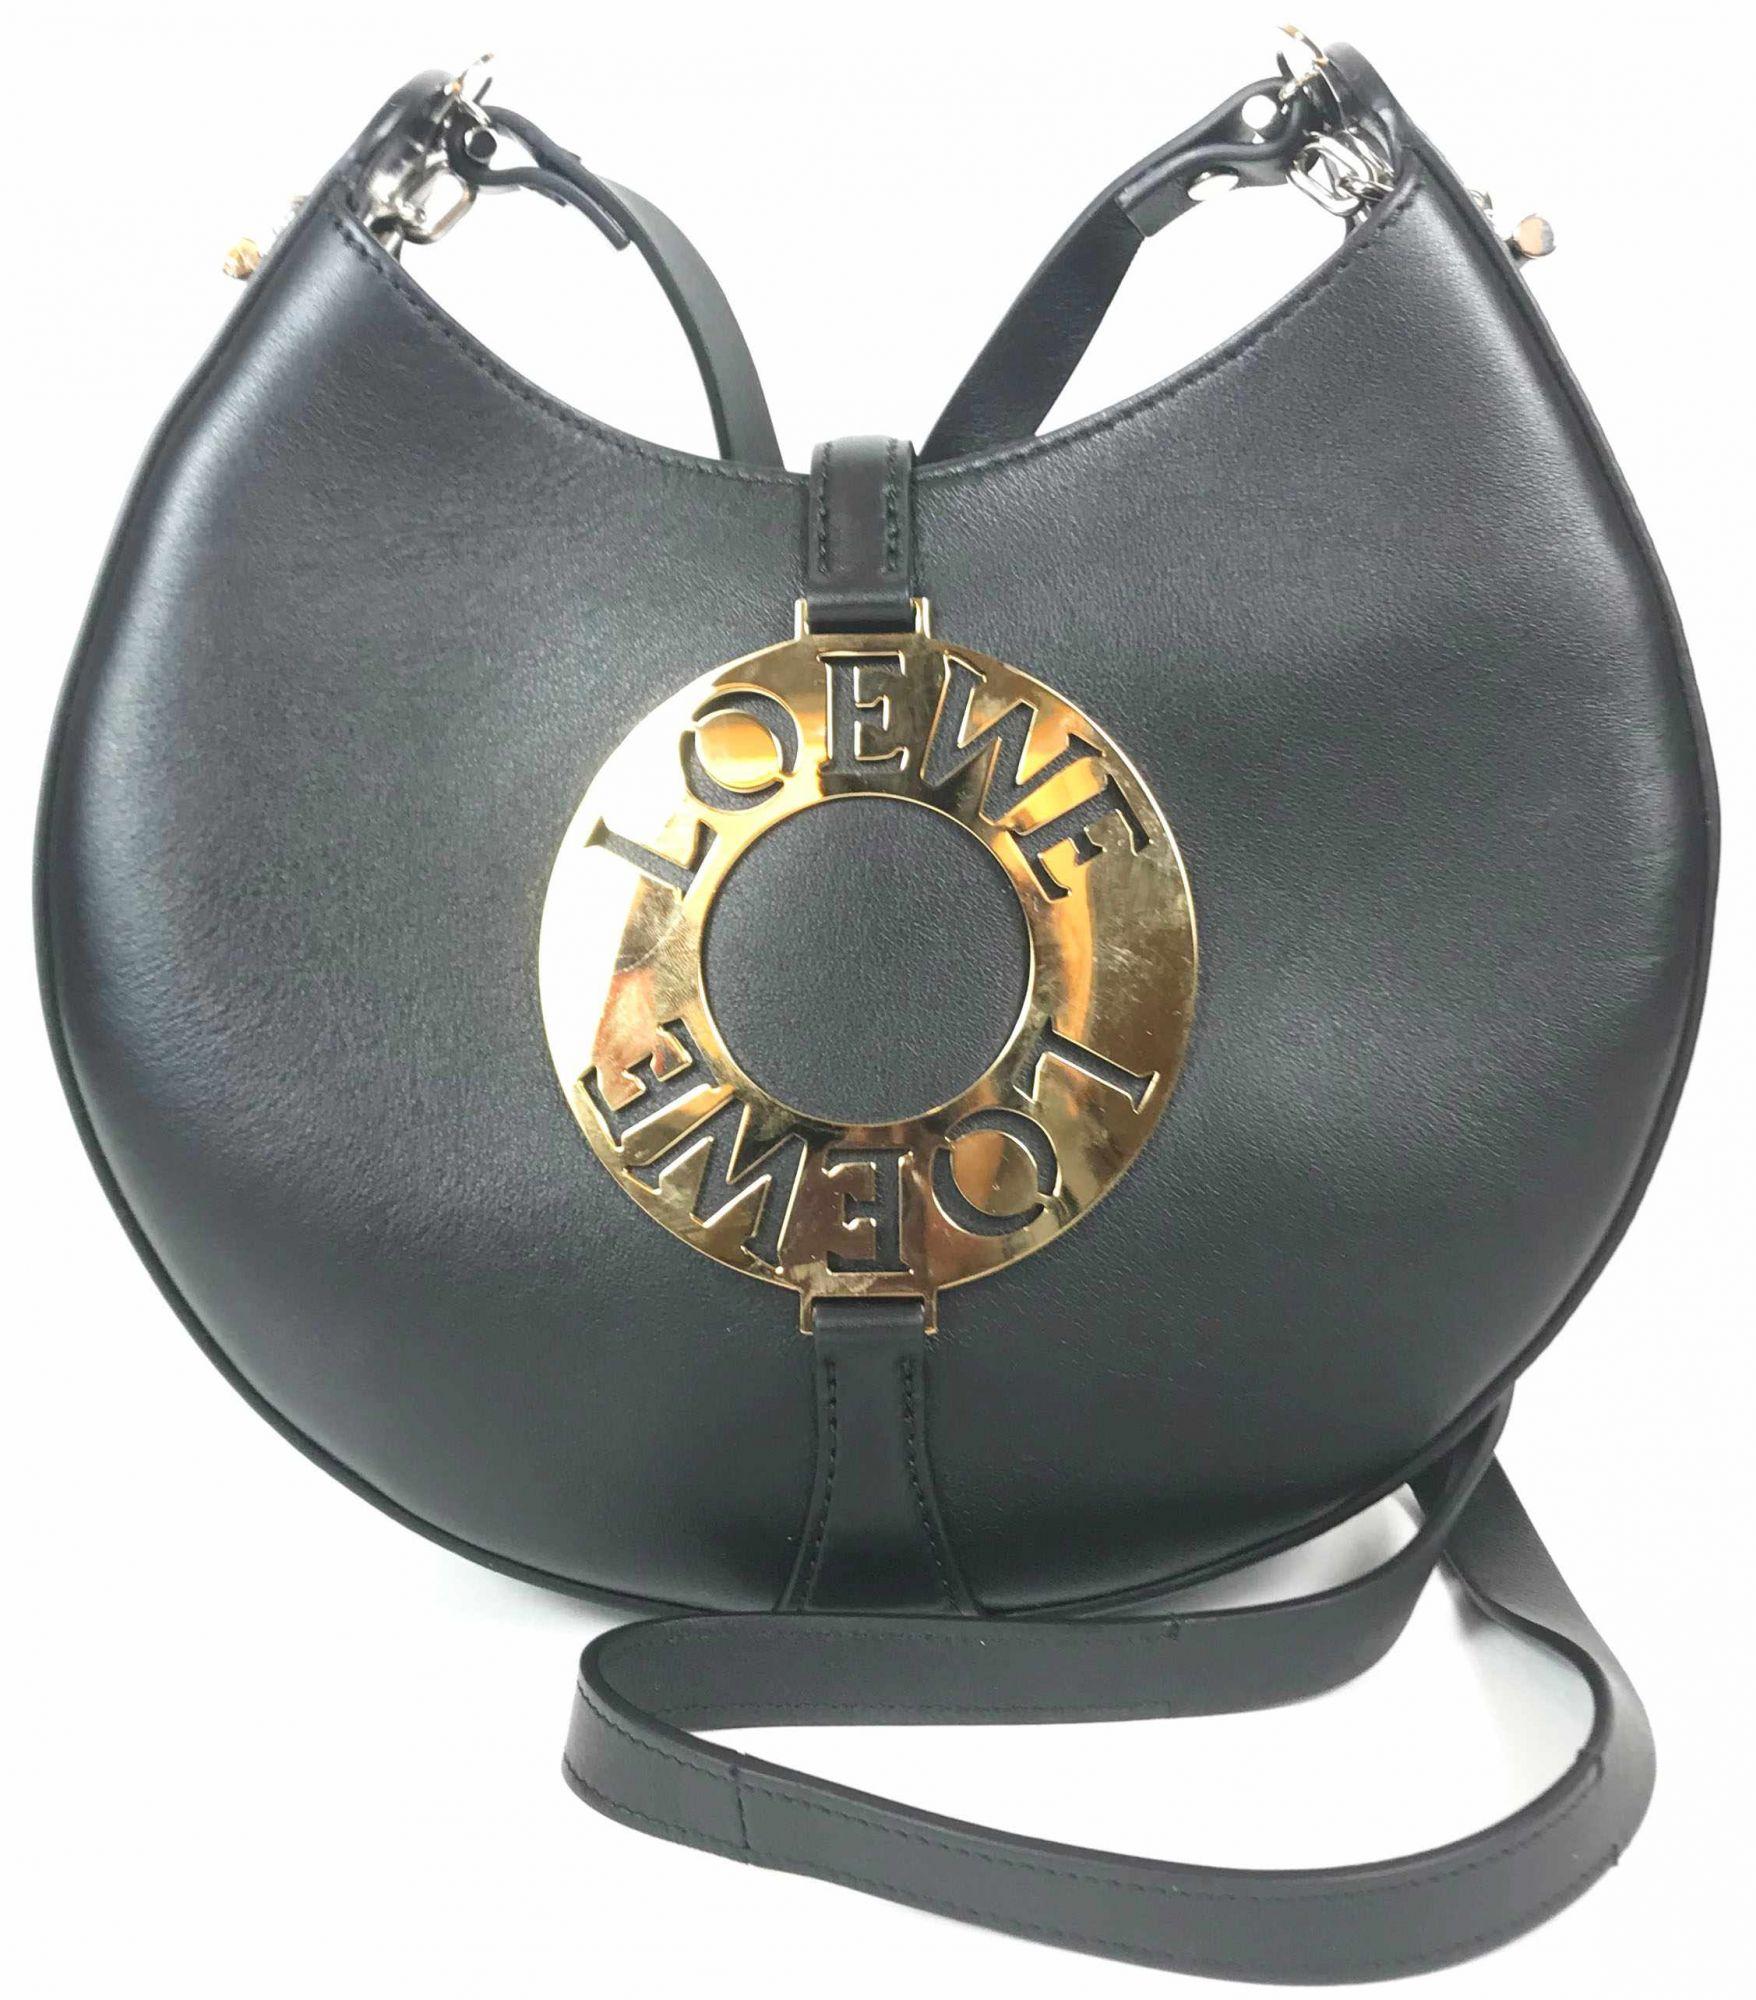 Joyce Small Bag Black/Silver/Gold